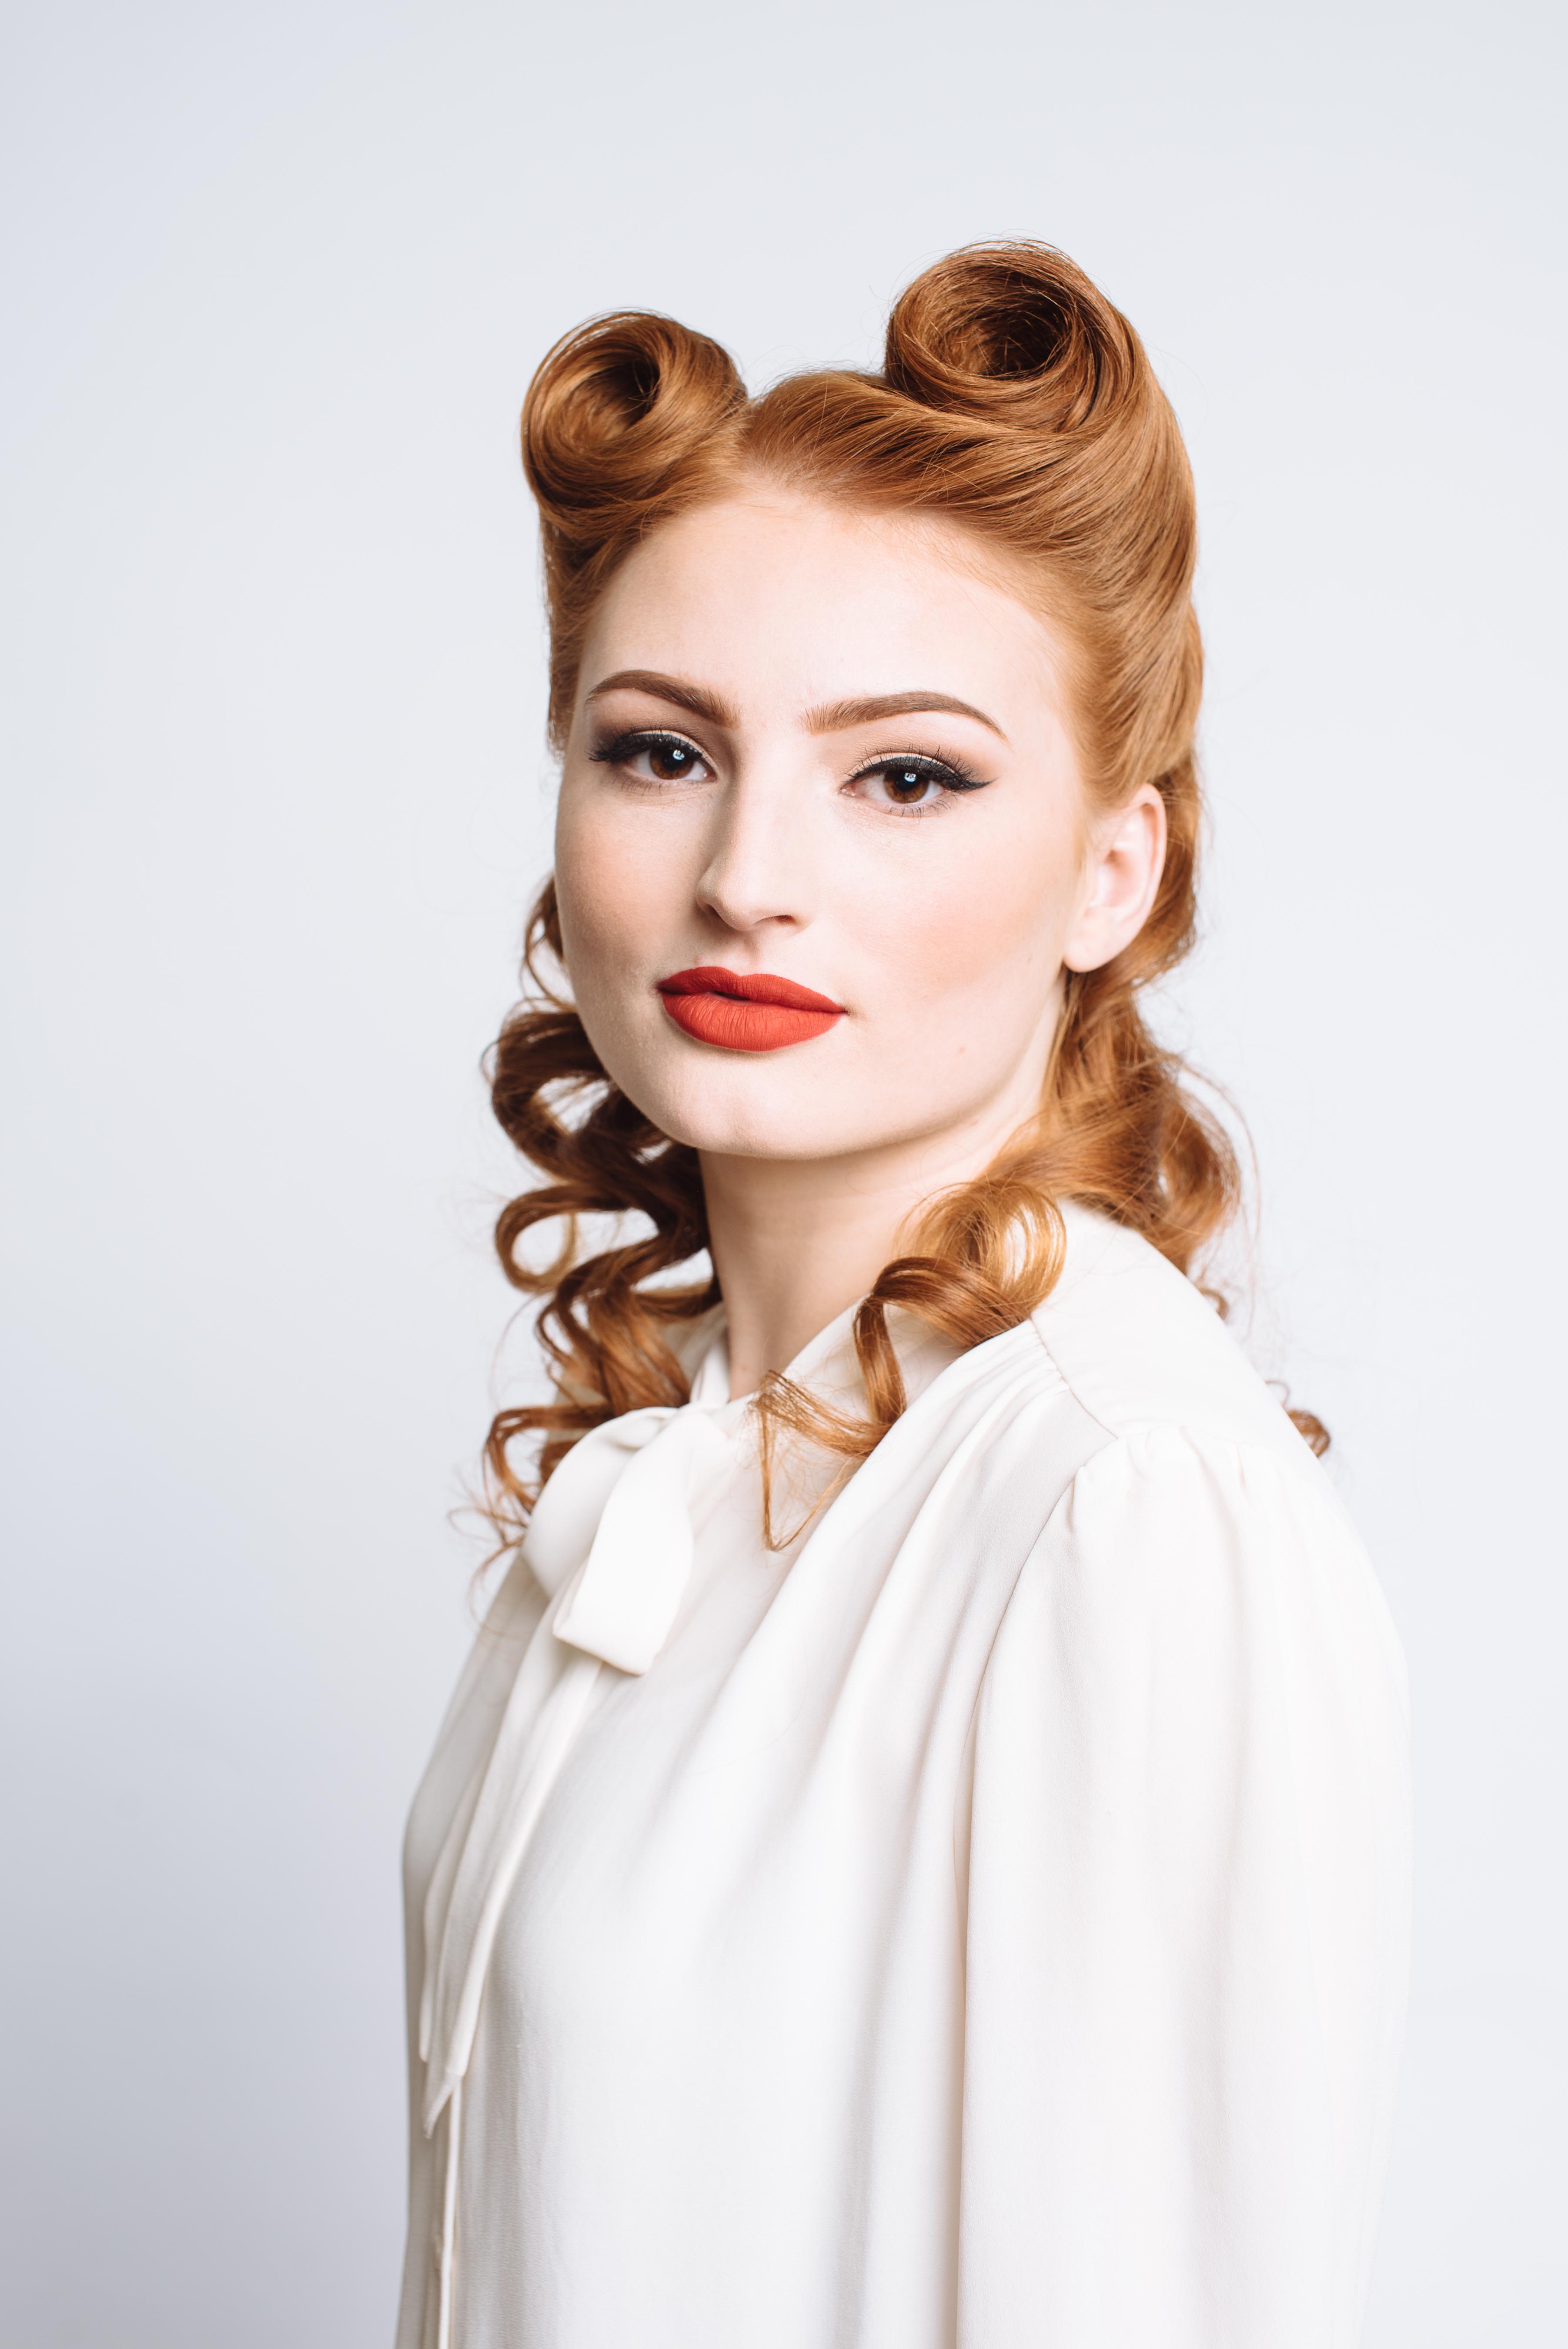 makeup, hair, photoshoot, vintage, victory rolls, red lip, lipstick, eyeliner, wing, winged eyeliner, 50s